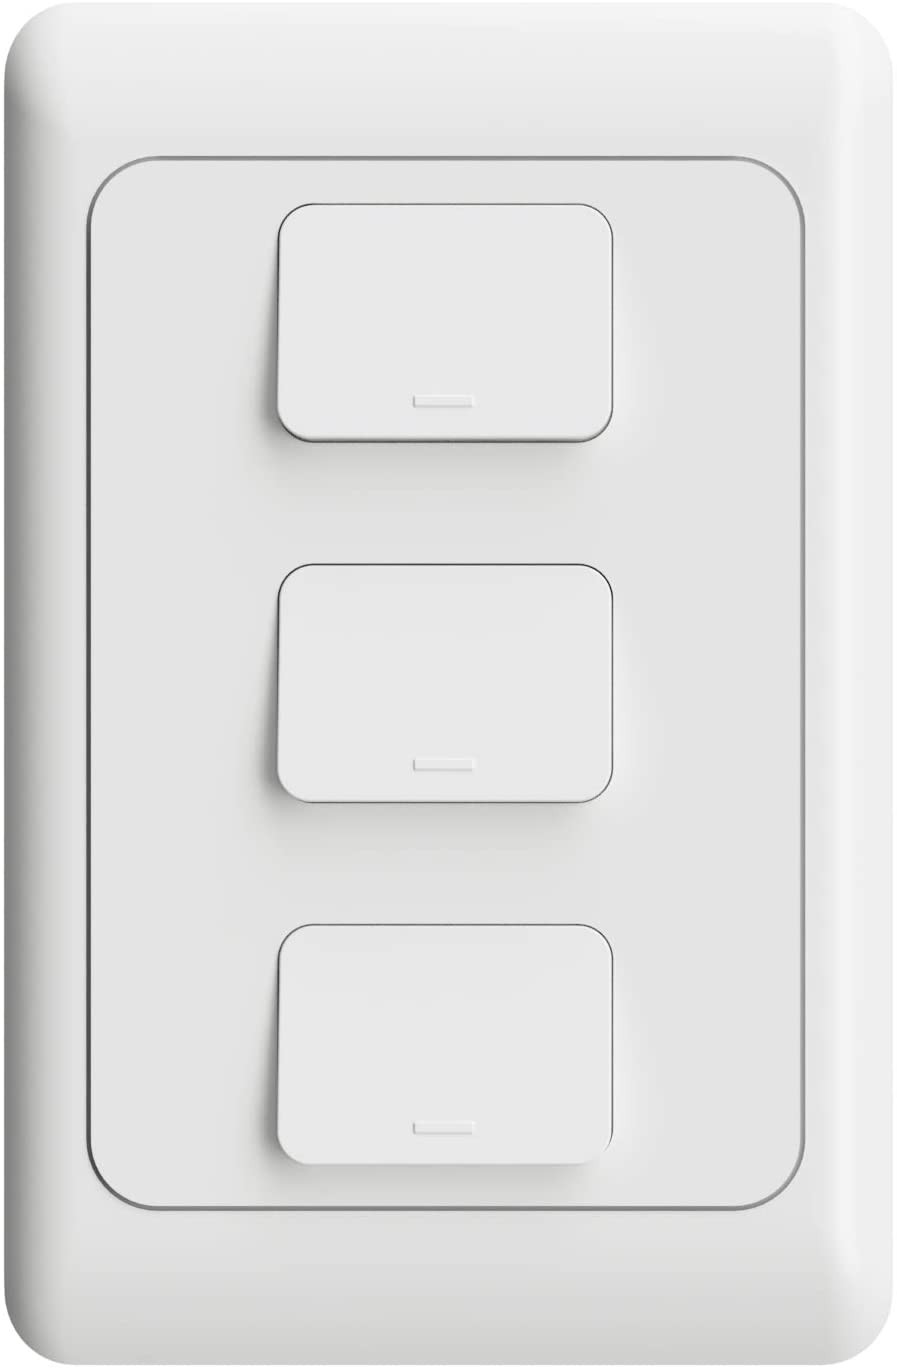 Interruptor Inteligente WiFi AGL - 03 teclas - Compatível com Alexa - Branco